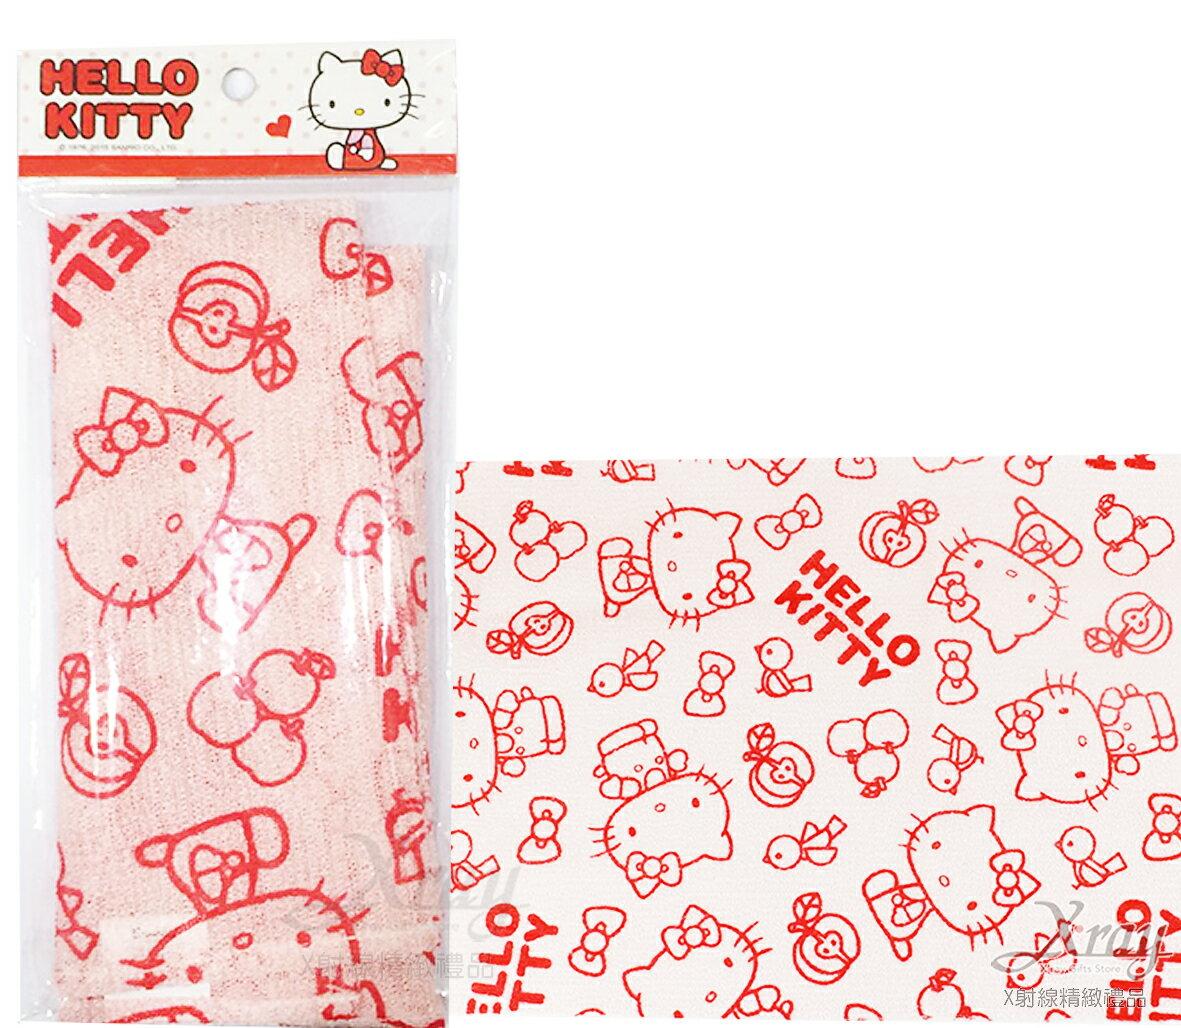 X射線【C263888】Hello Kitty沐浴巾(紅),澡巾/刷背巾/沐浴巾/洗澡/台灣製